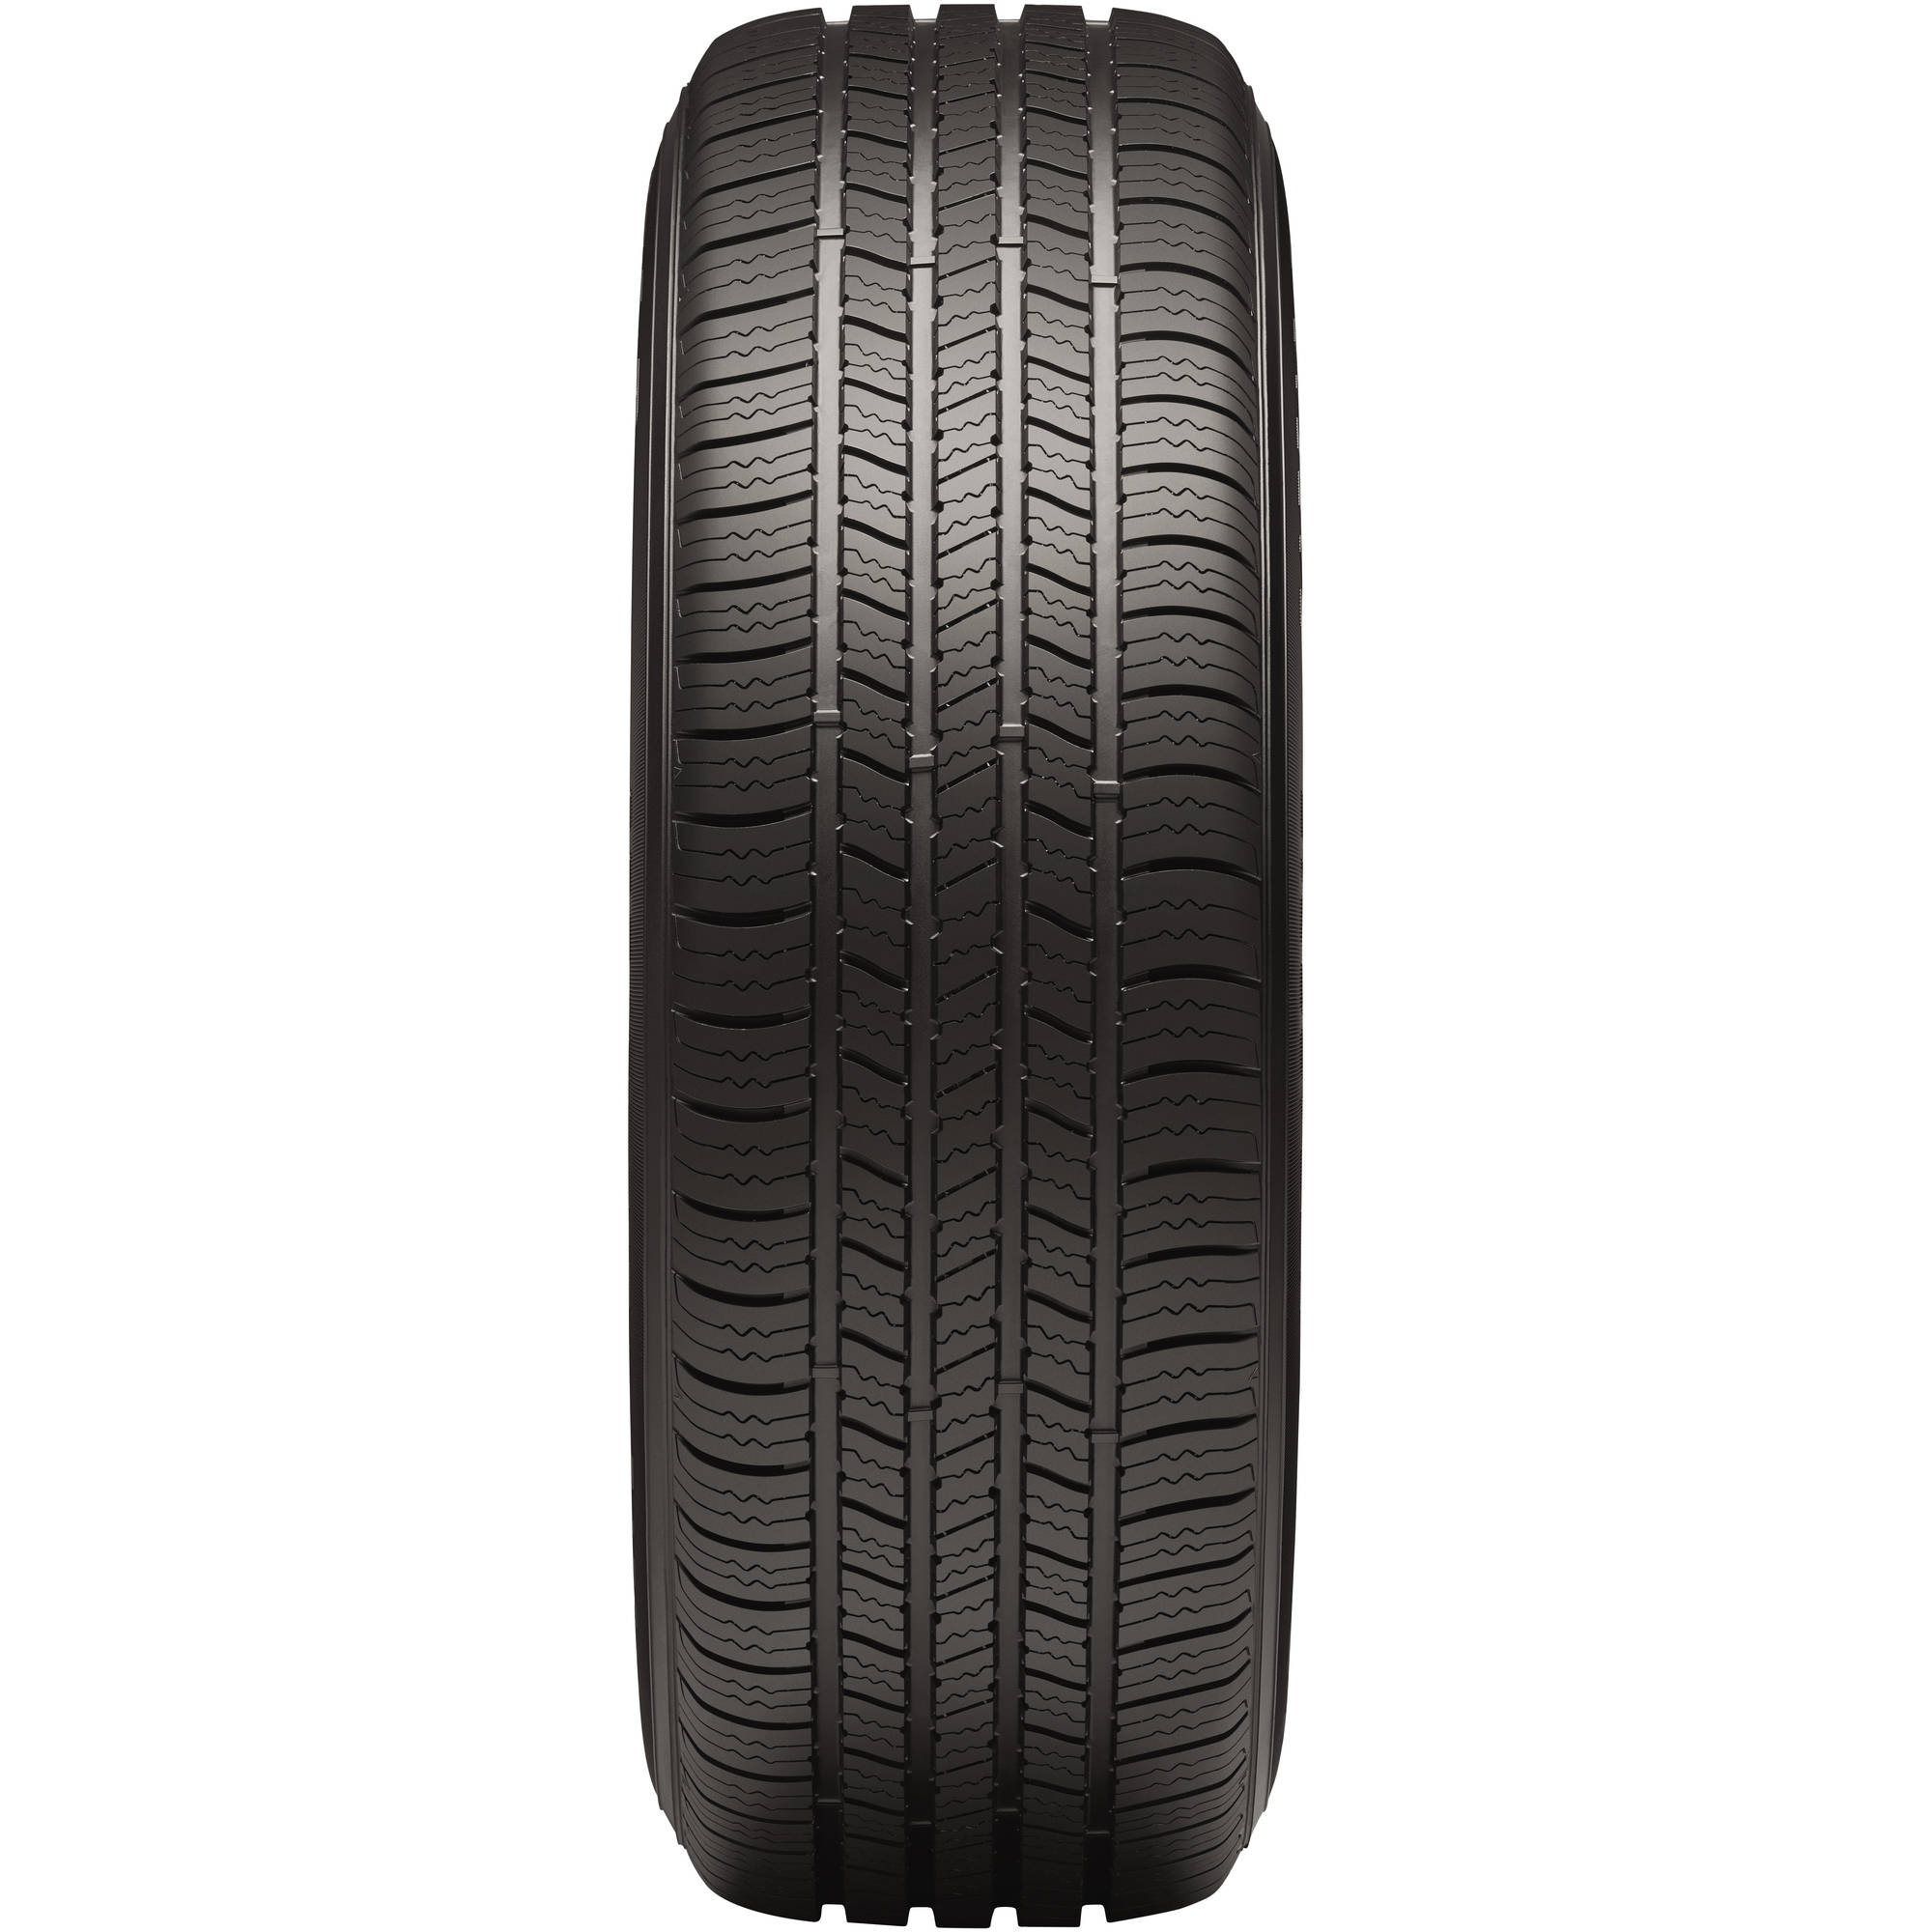 Goodyear Viva 3 All Season Tire 195 60r15 88t Walmart Com